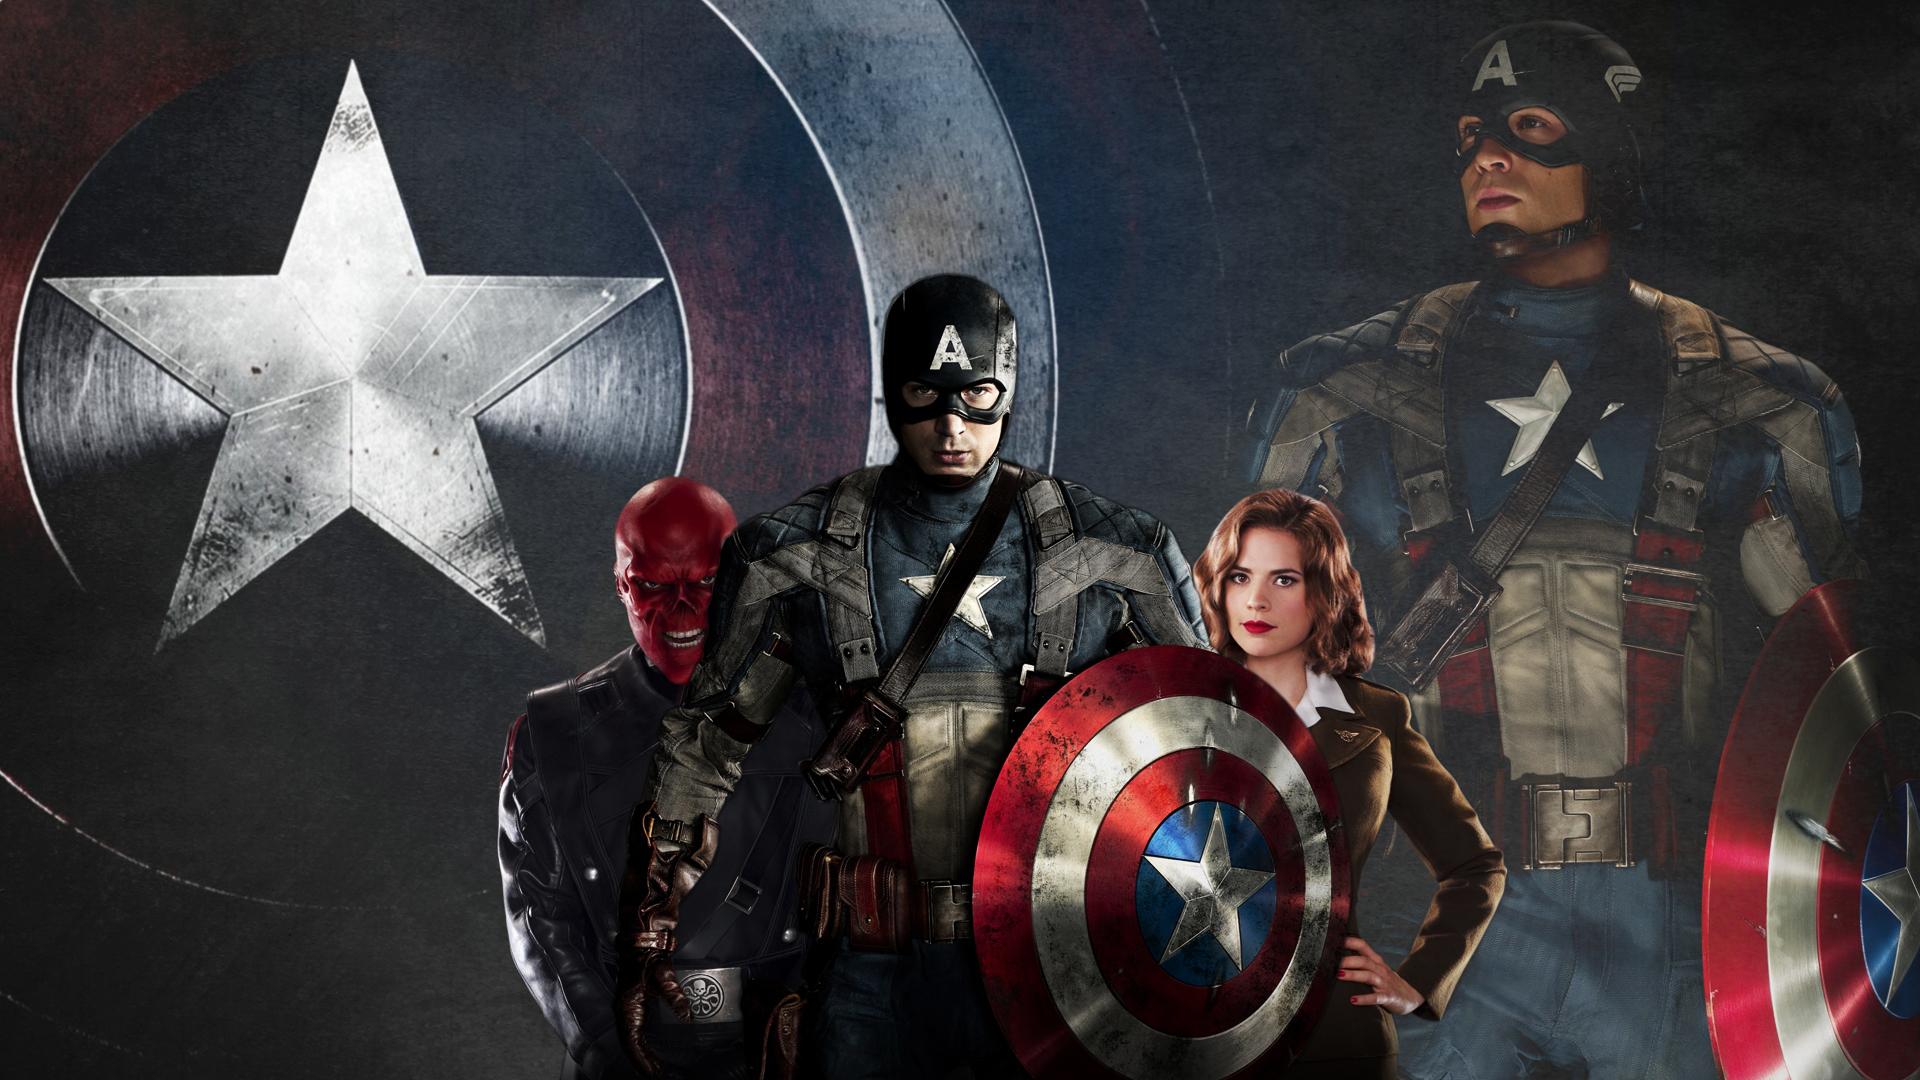 Captain America wallpaper 1920x1080 1   hebusorg   High Definition 1920x1080